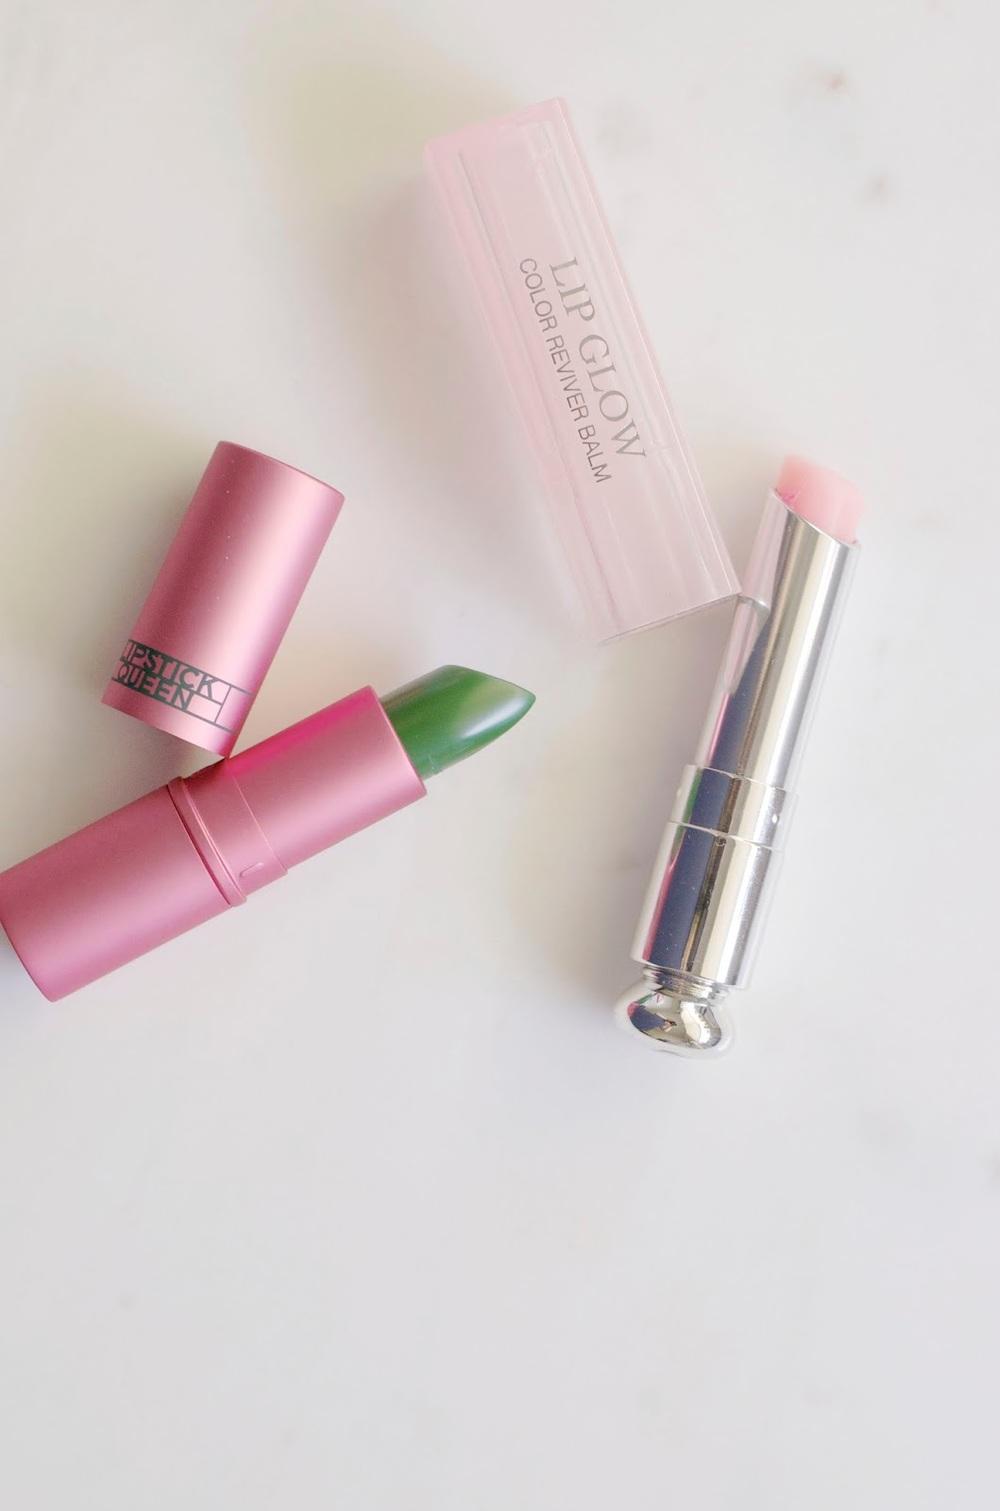 Lipstick Queen, Lipstick Queen Frog Prince, Dior, Dior Lip Glow